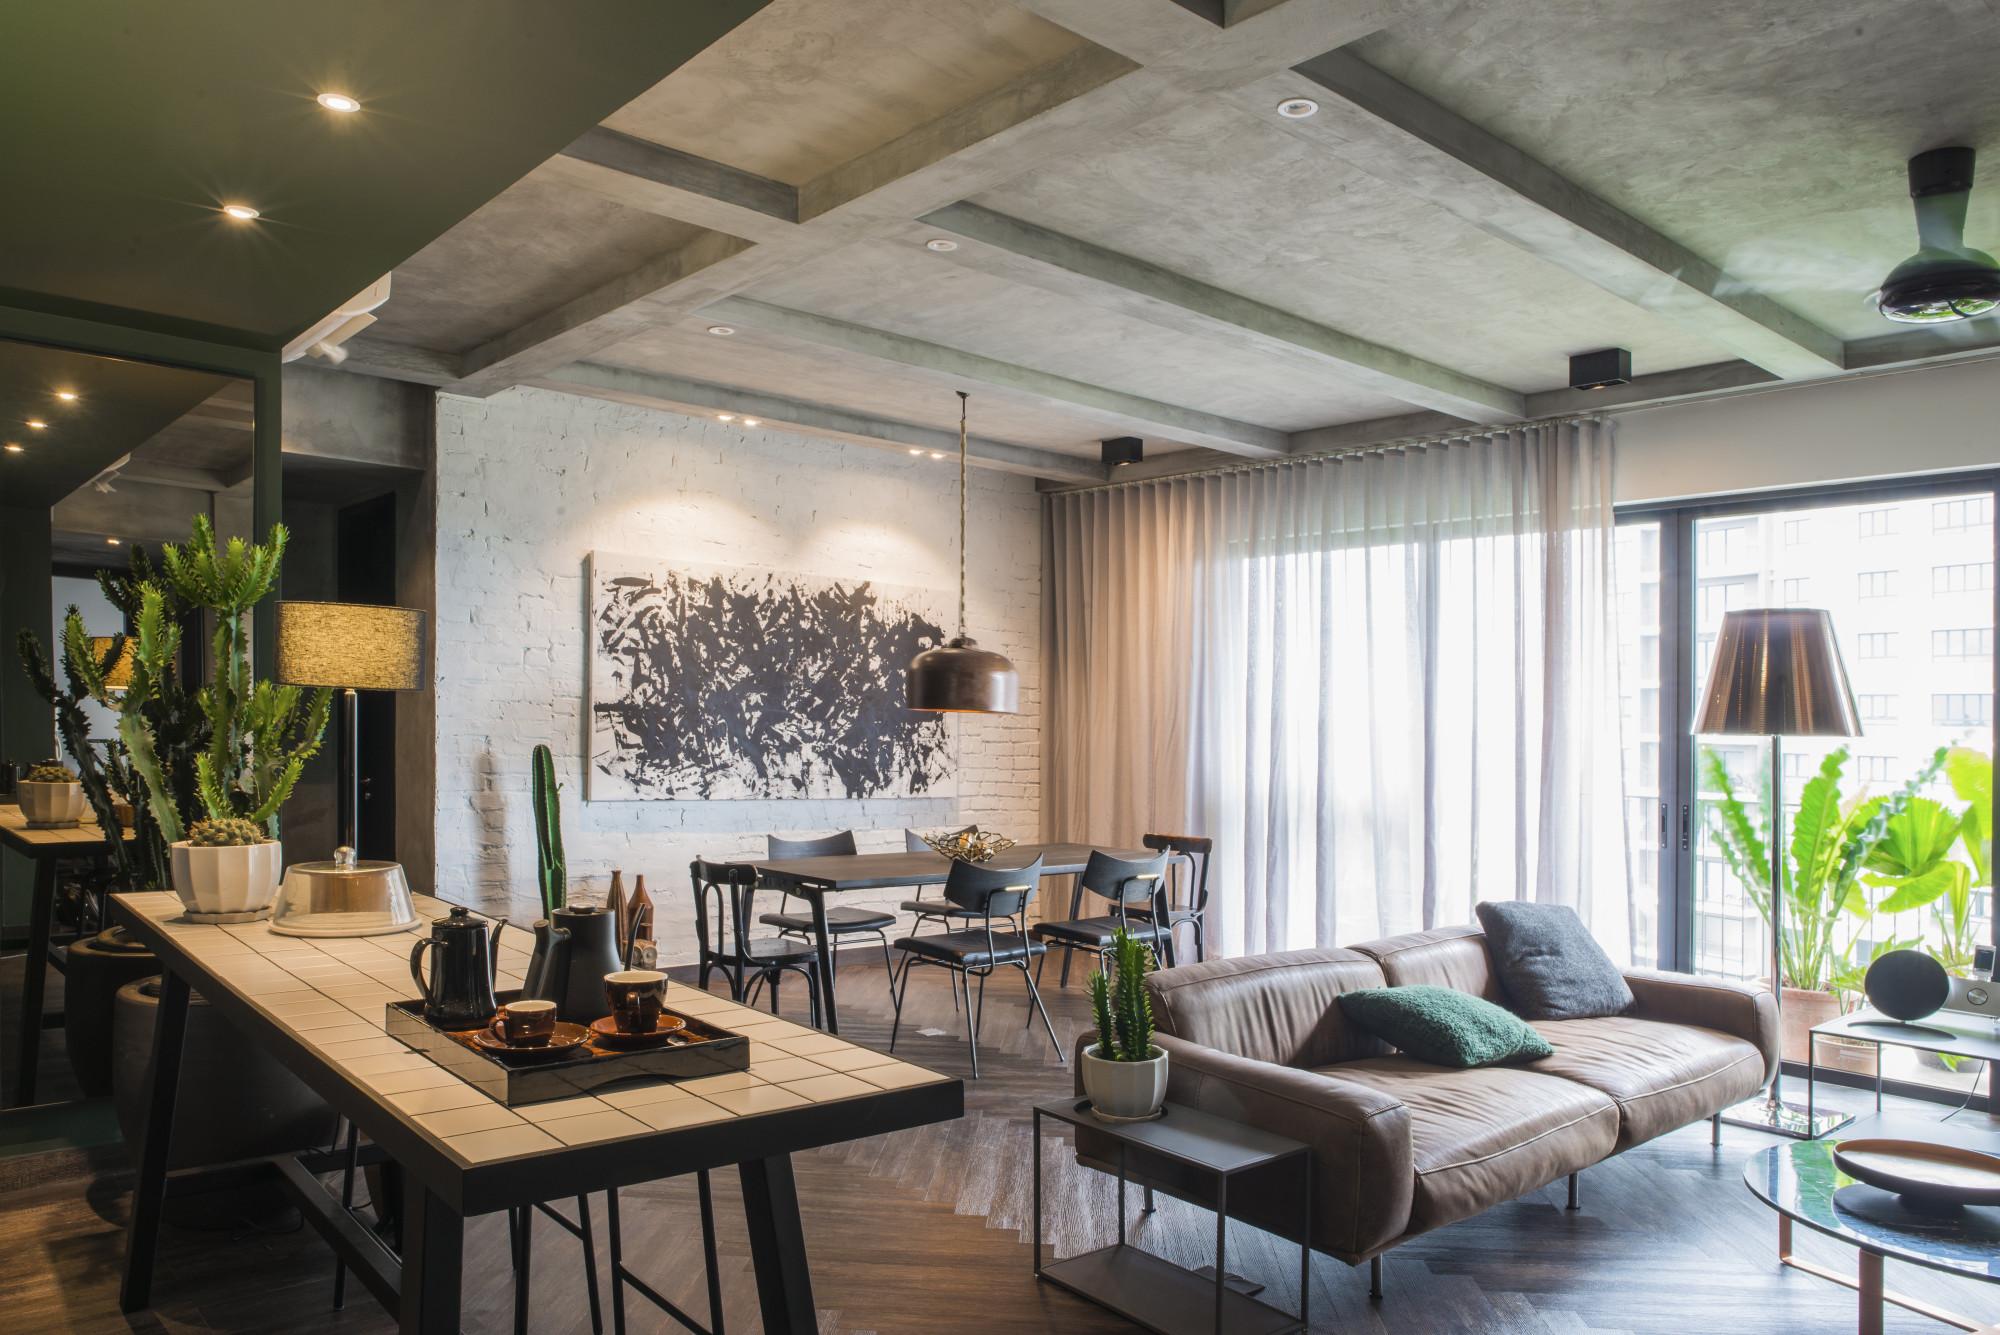 Home Decor Ideas For A Modern